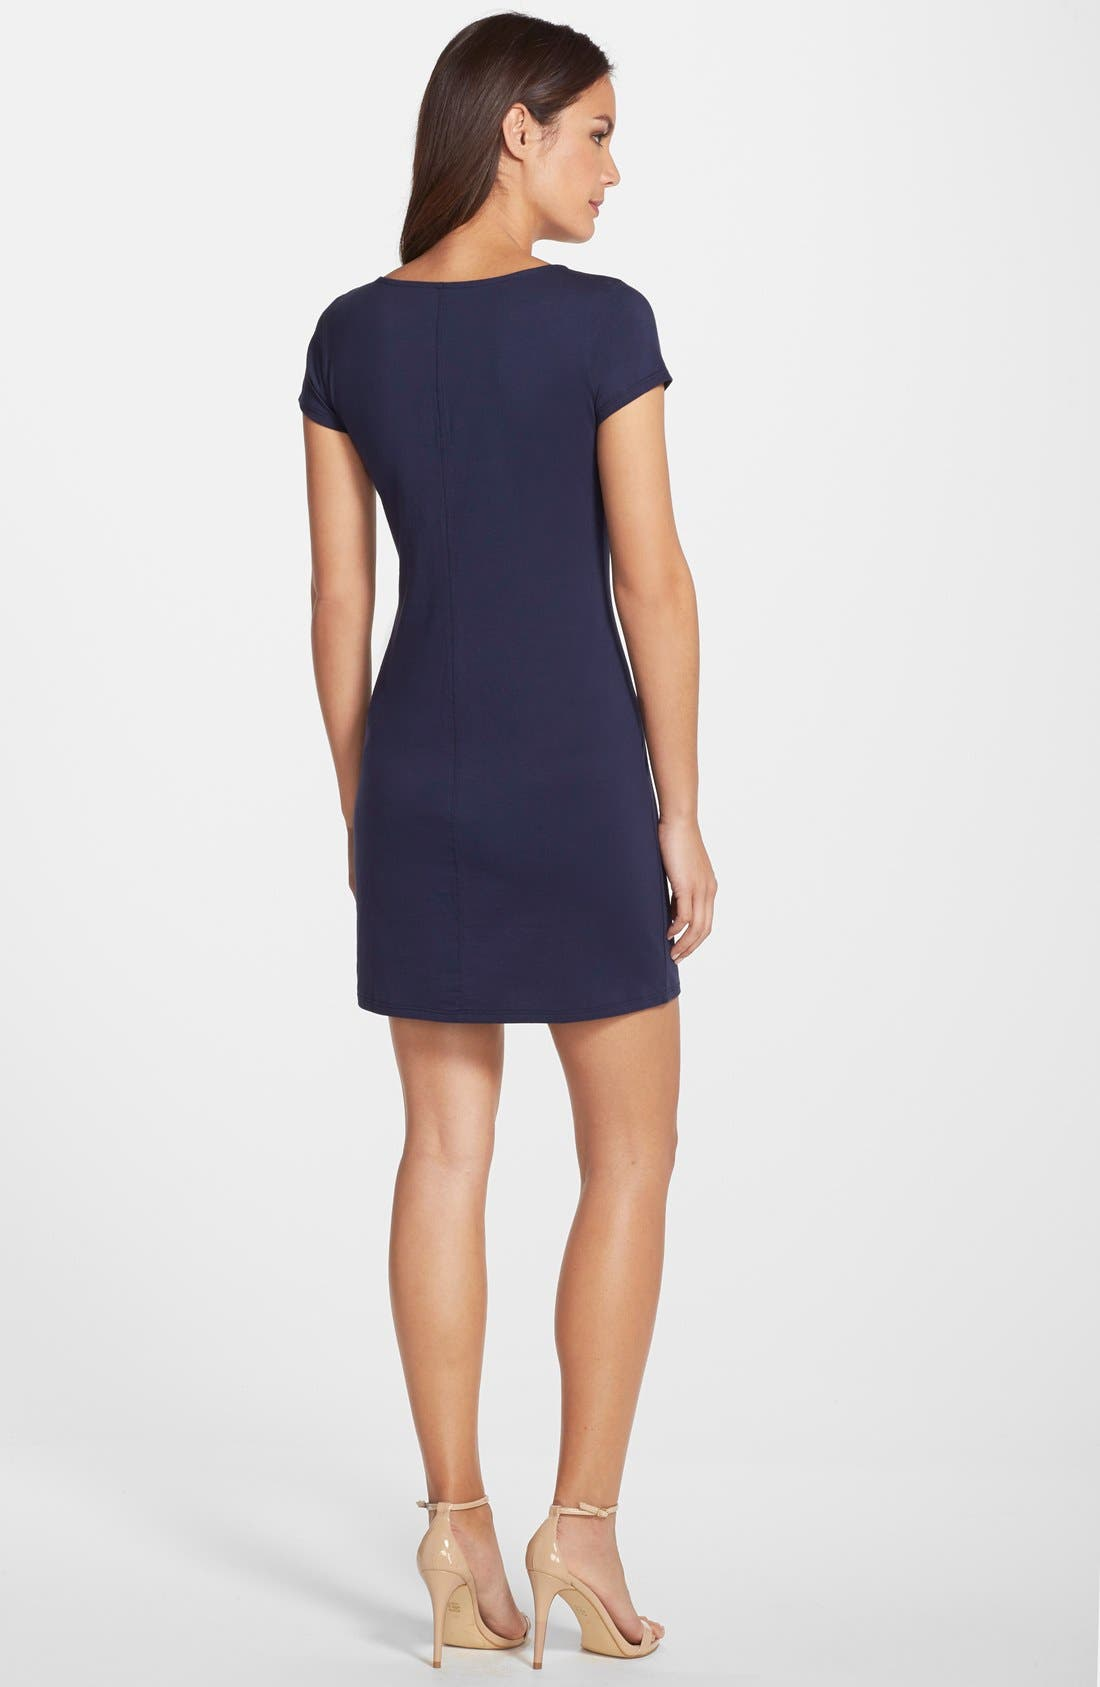 'Brewster' Contrast Trim T-Shirt Dress,                             Alternate thumbnail 9, color,                             TRUE NAVY